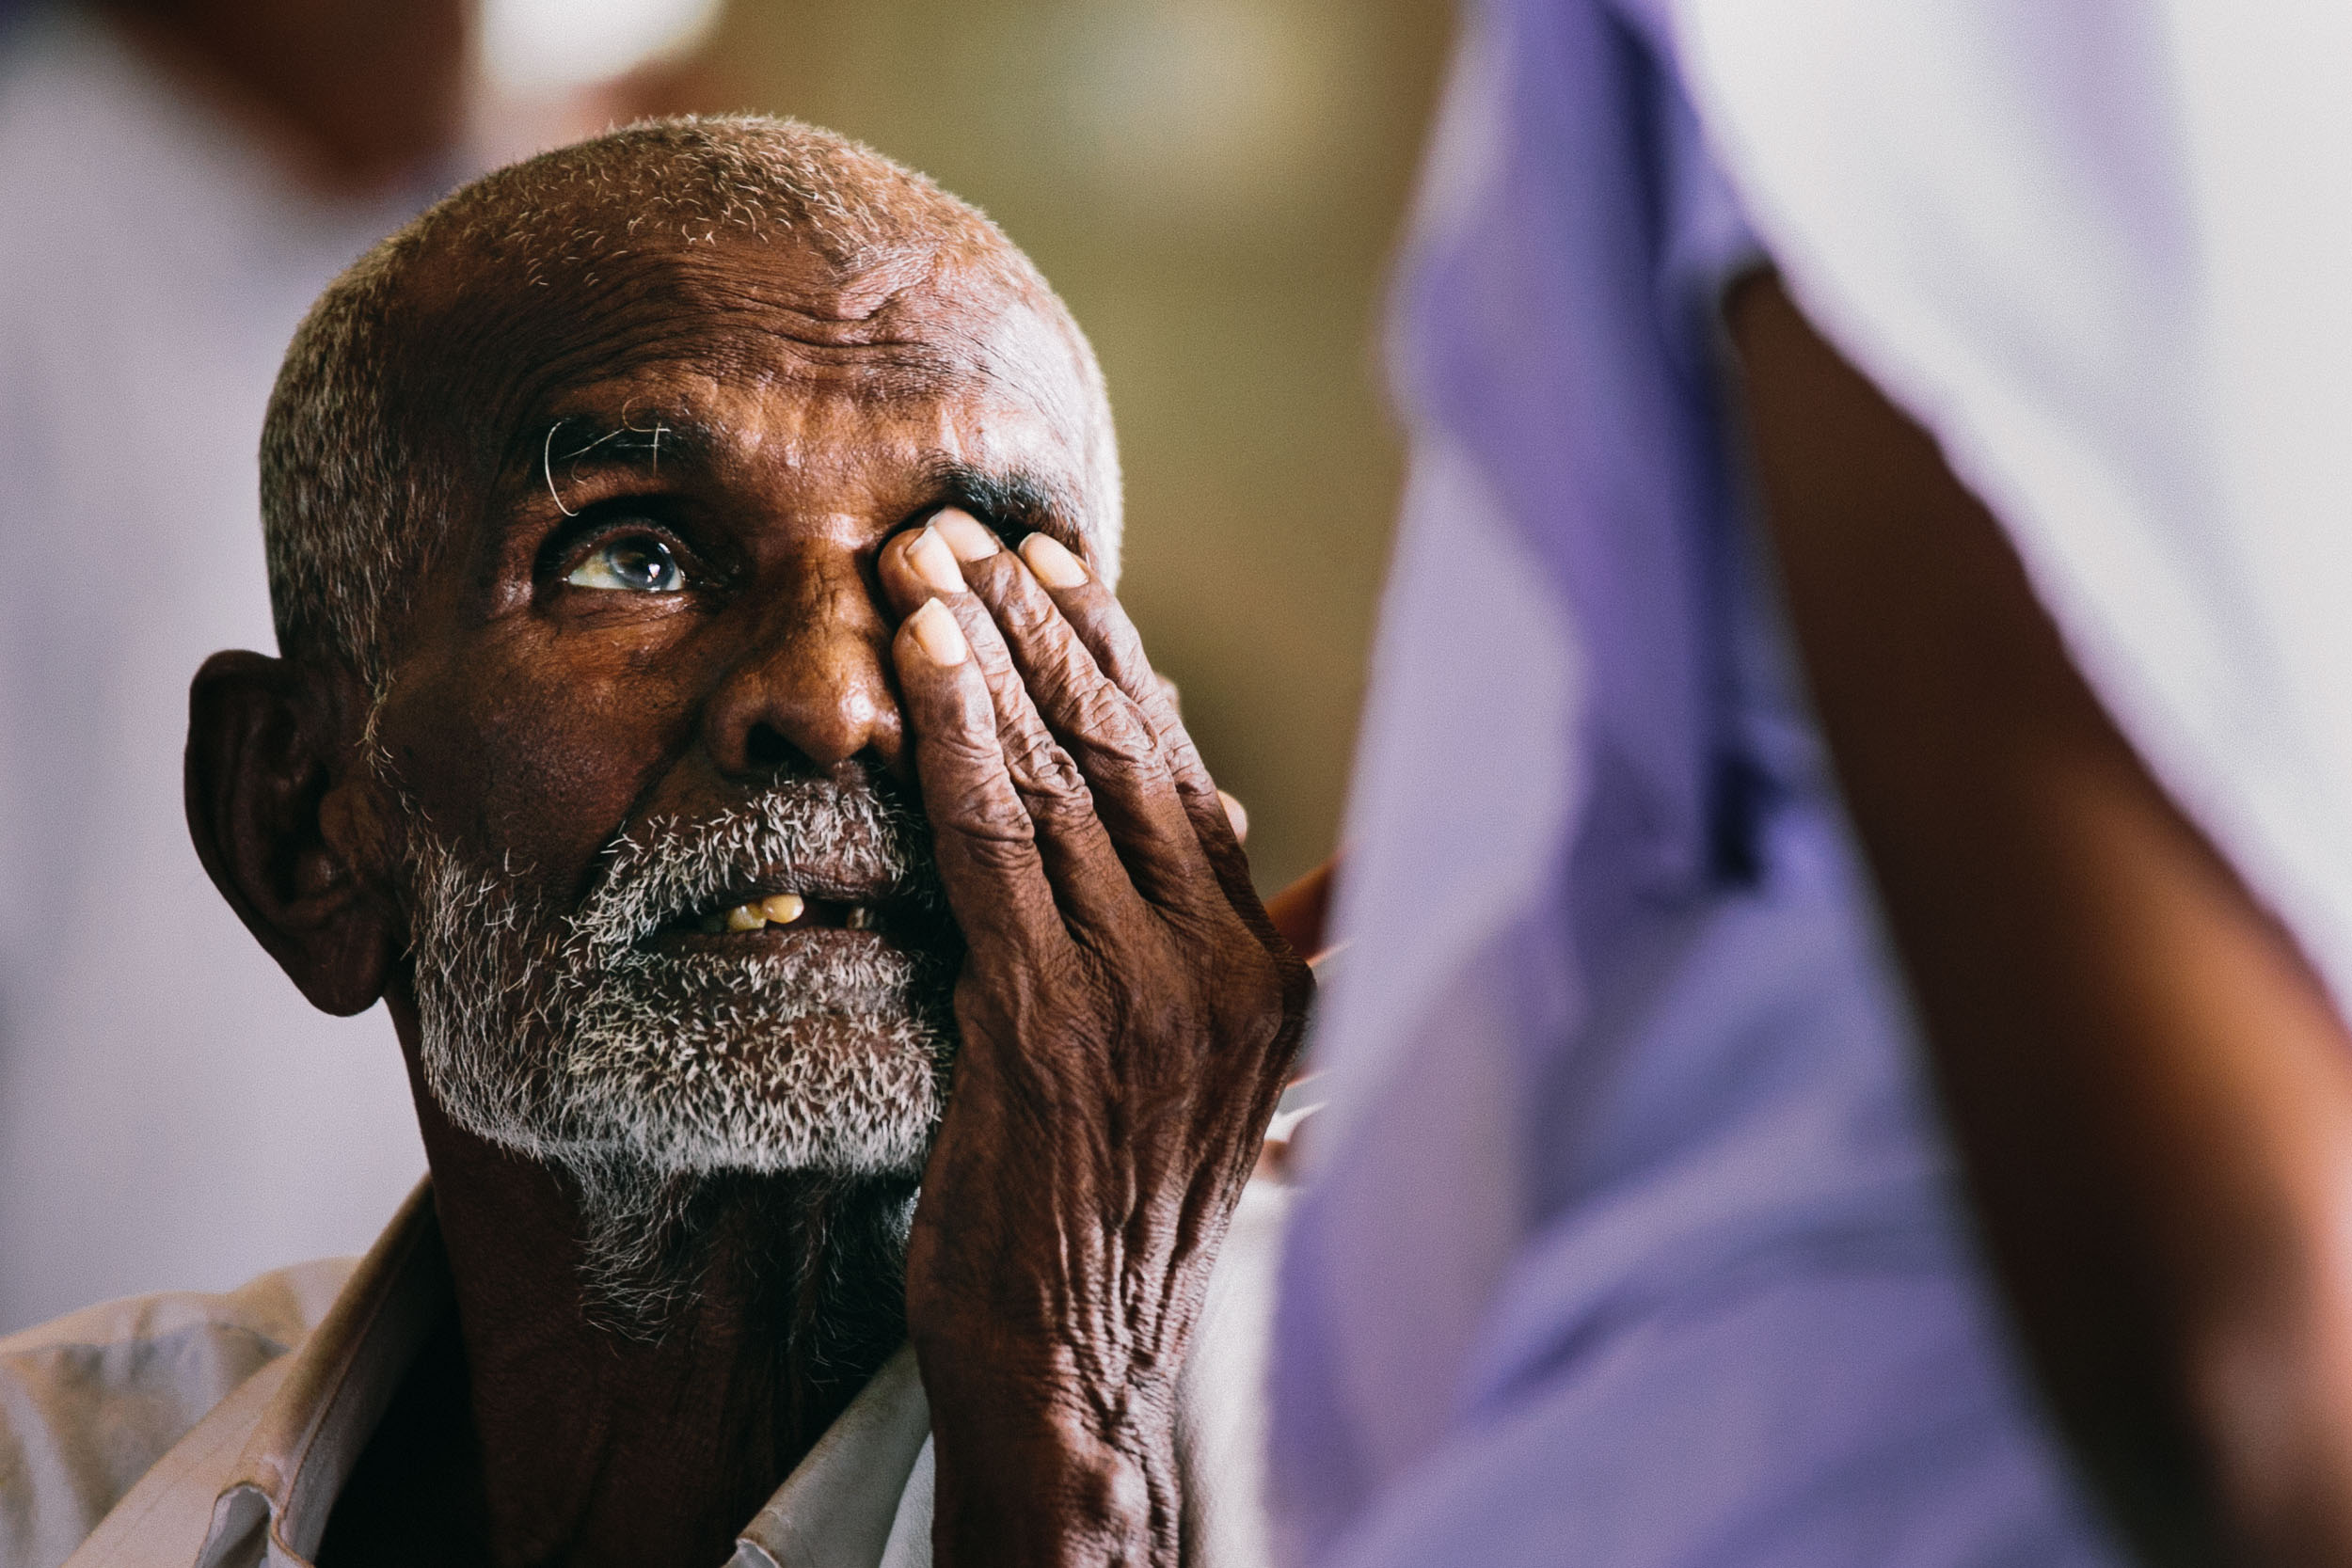 brian-callaway-india-photography-aravind-eye-hospital-22.jpg